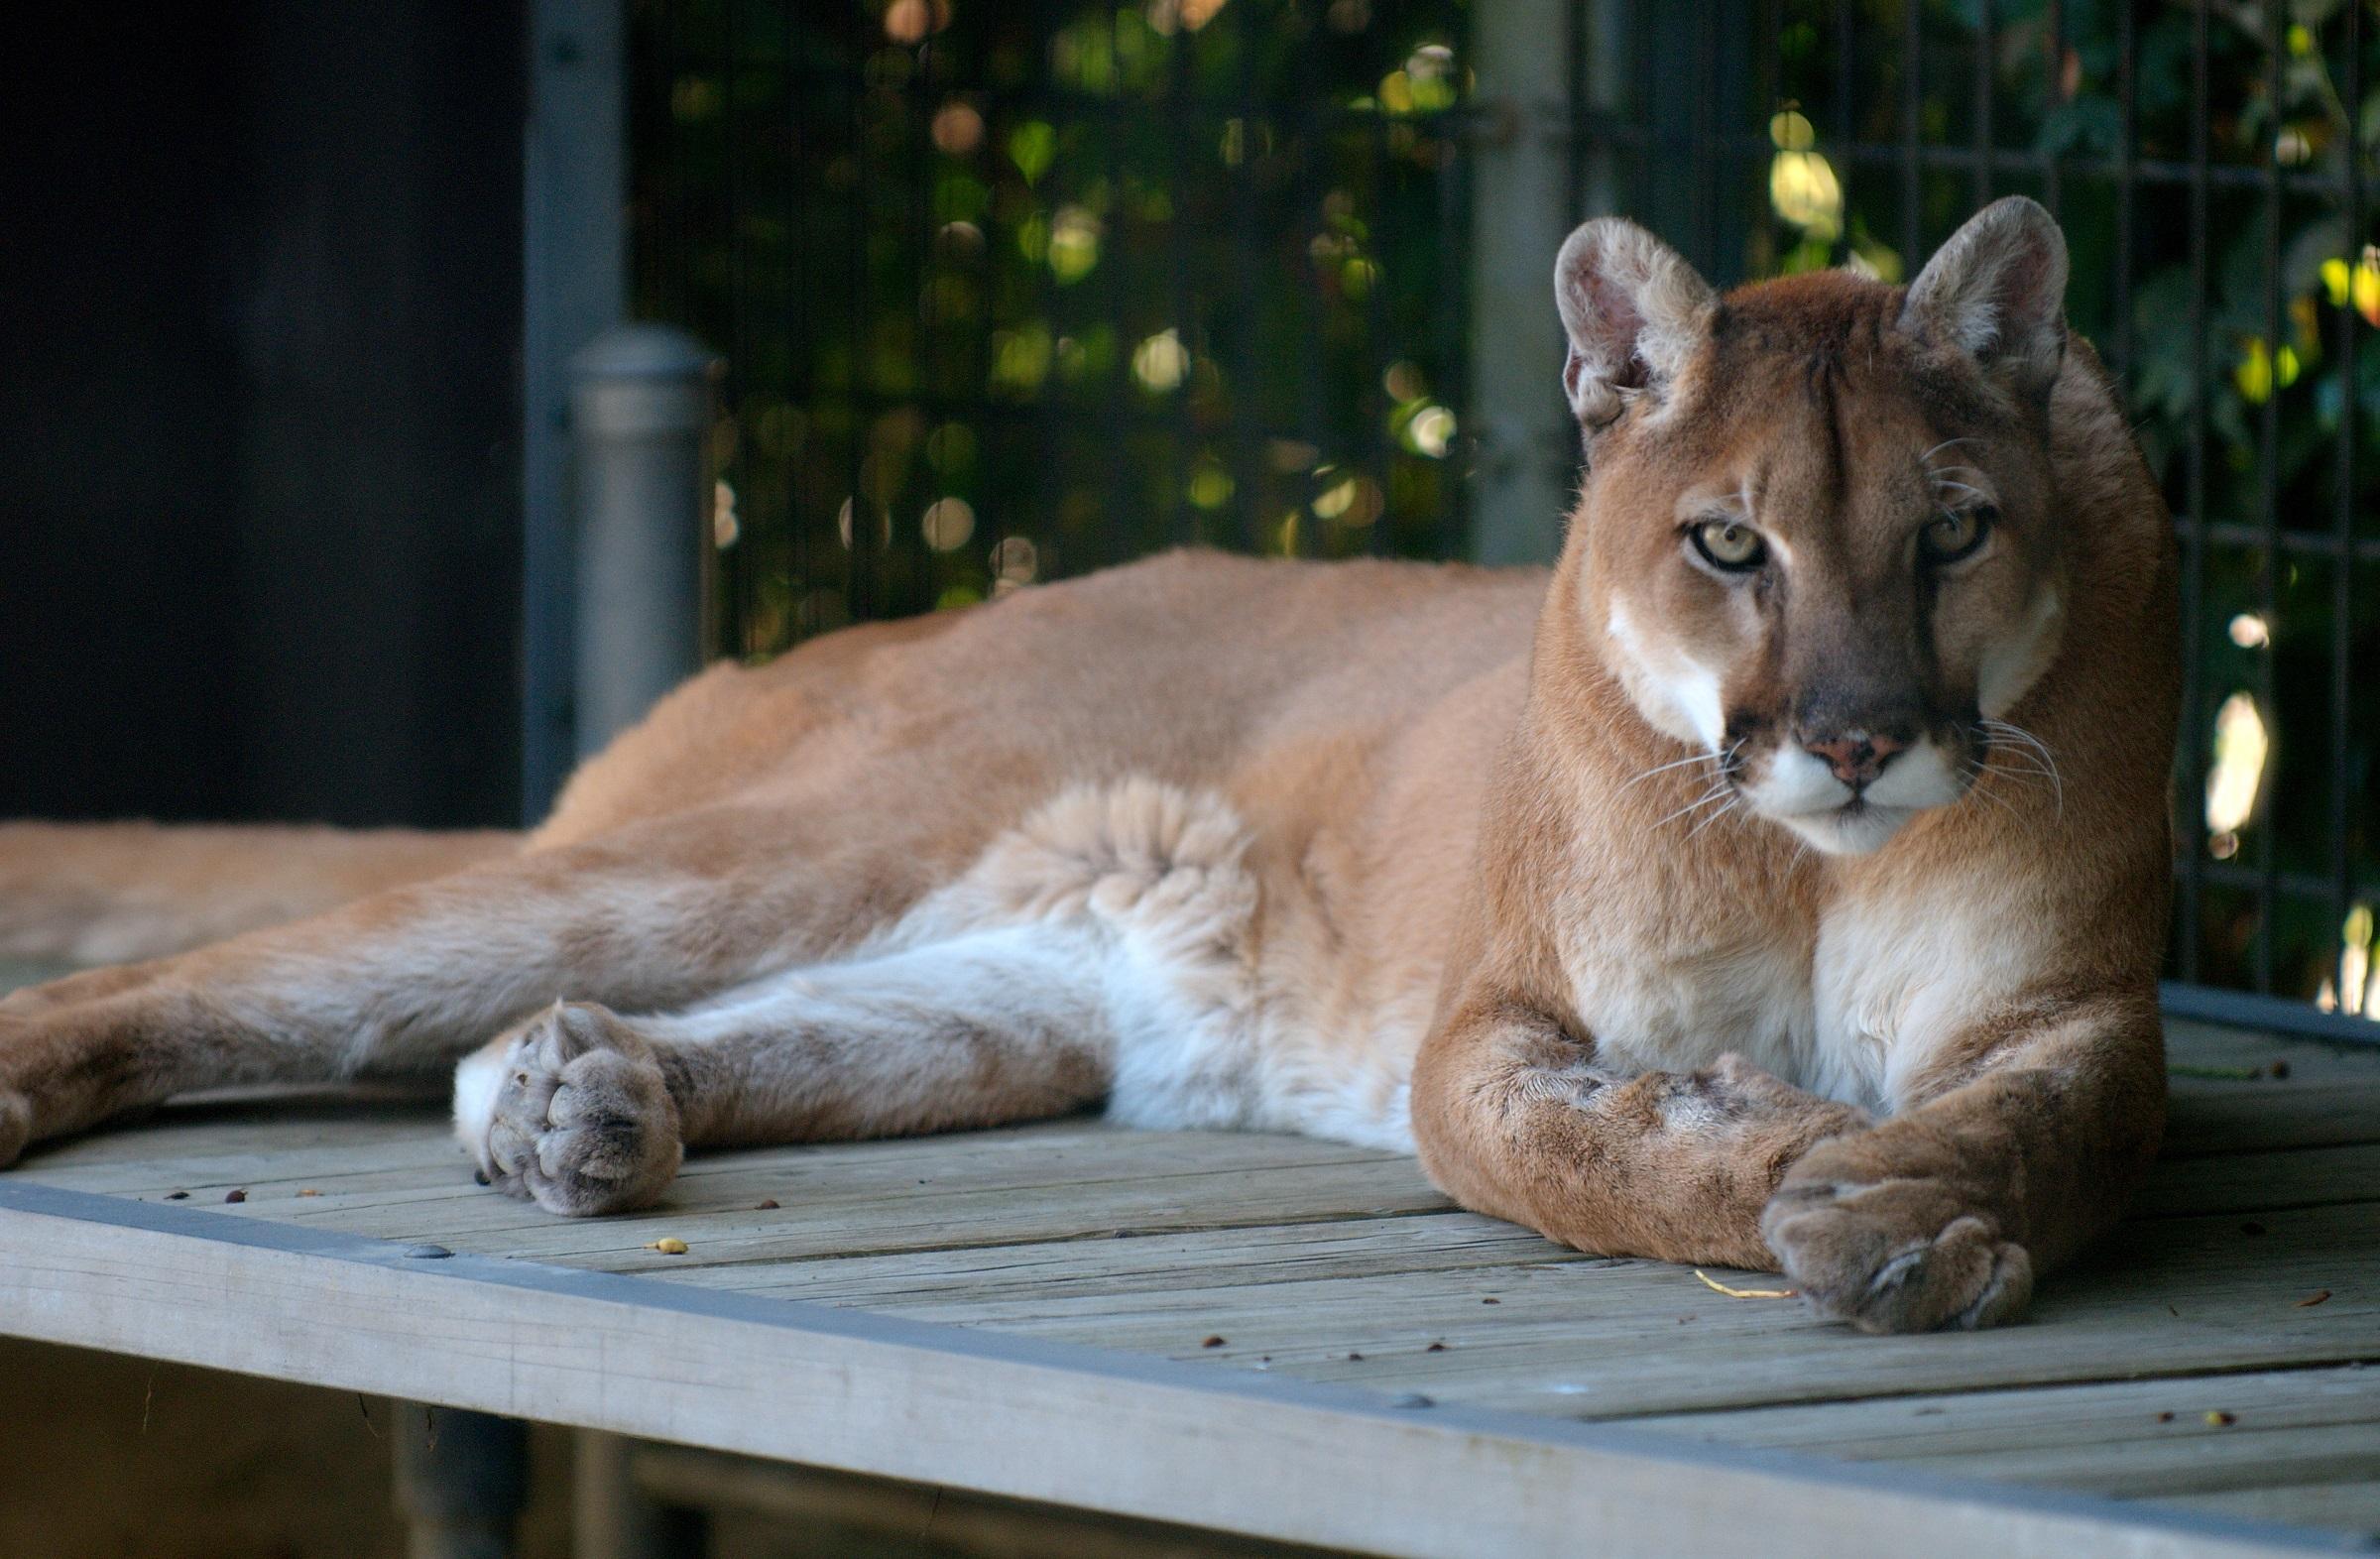 Wild cougar photo